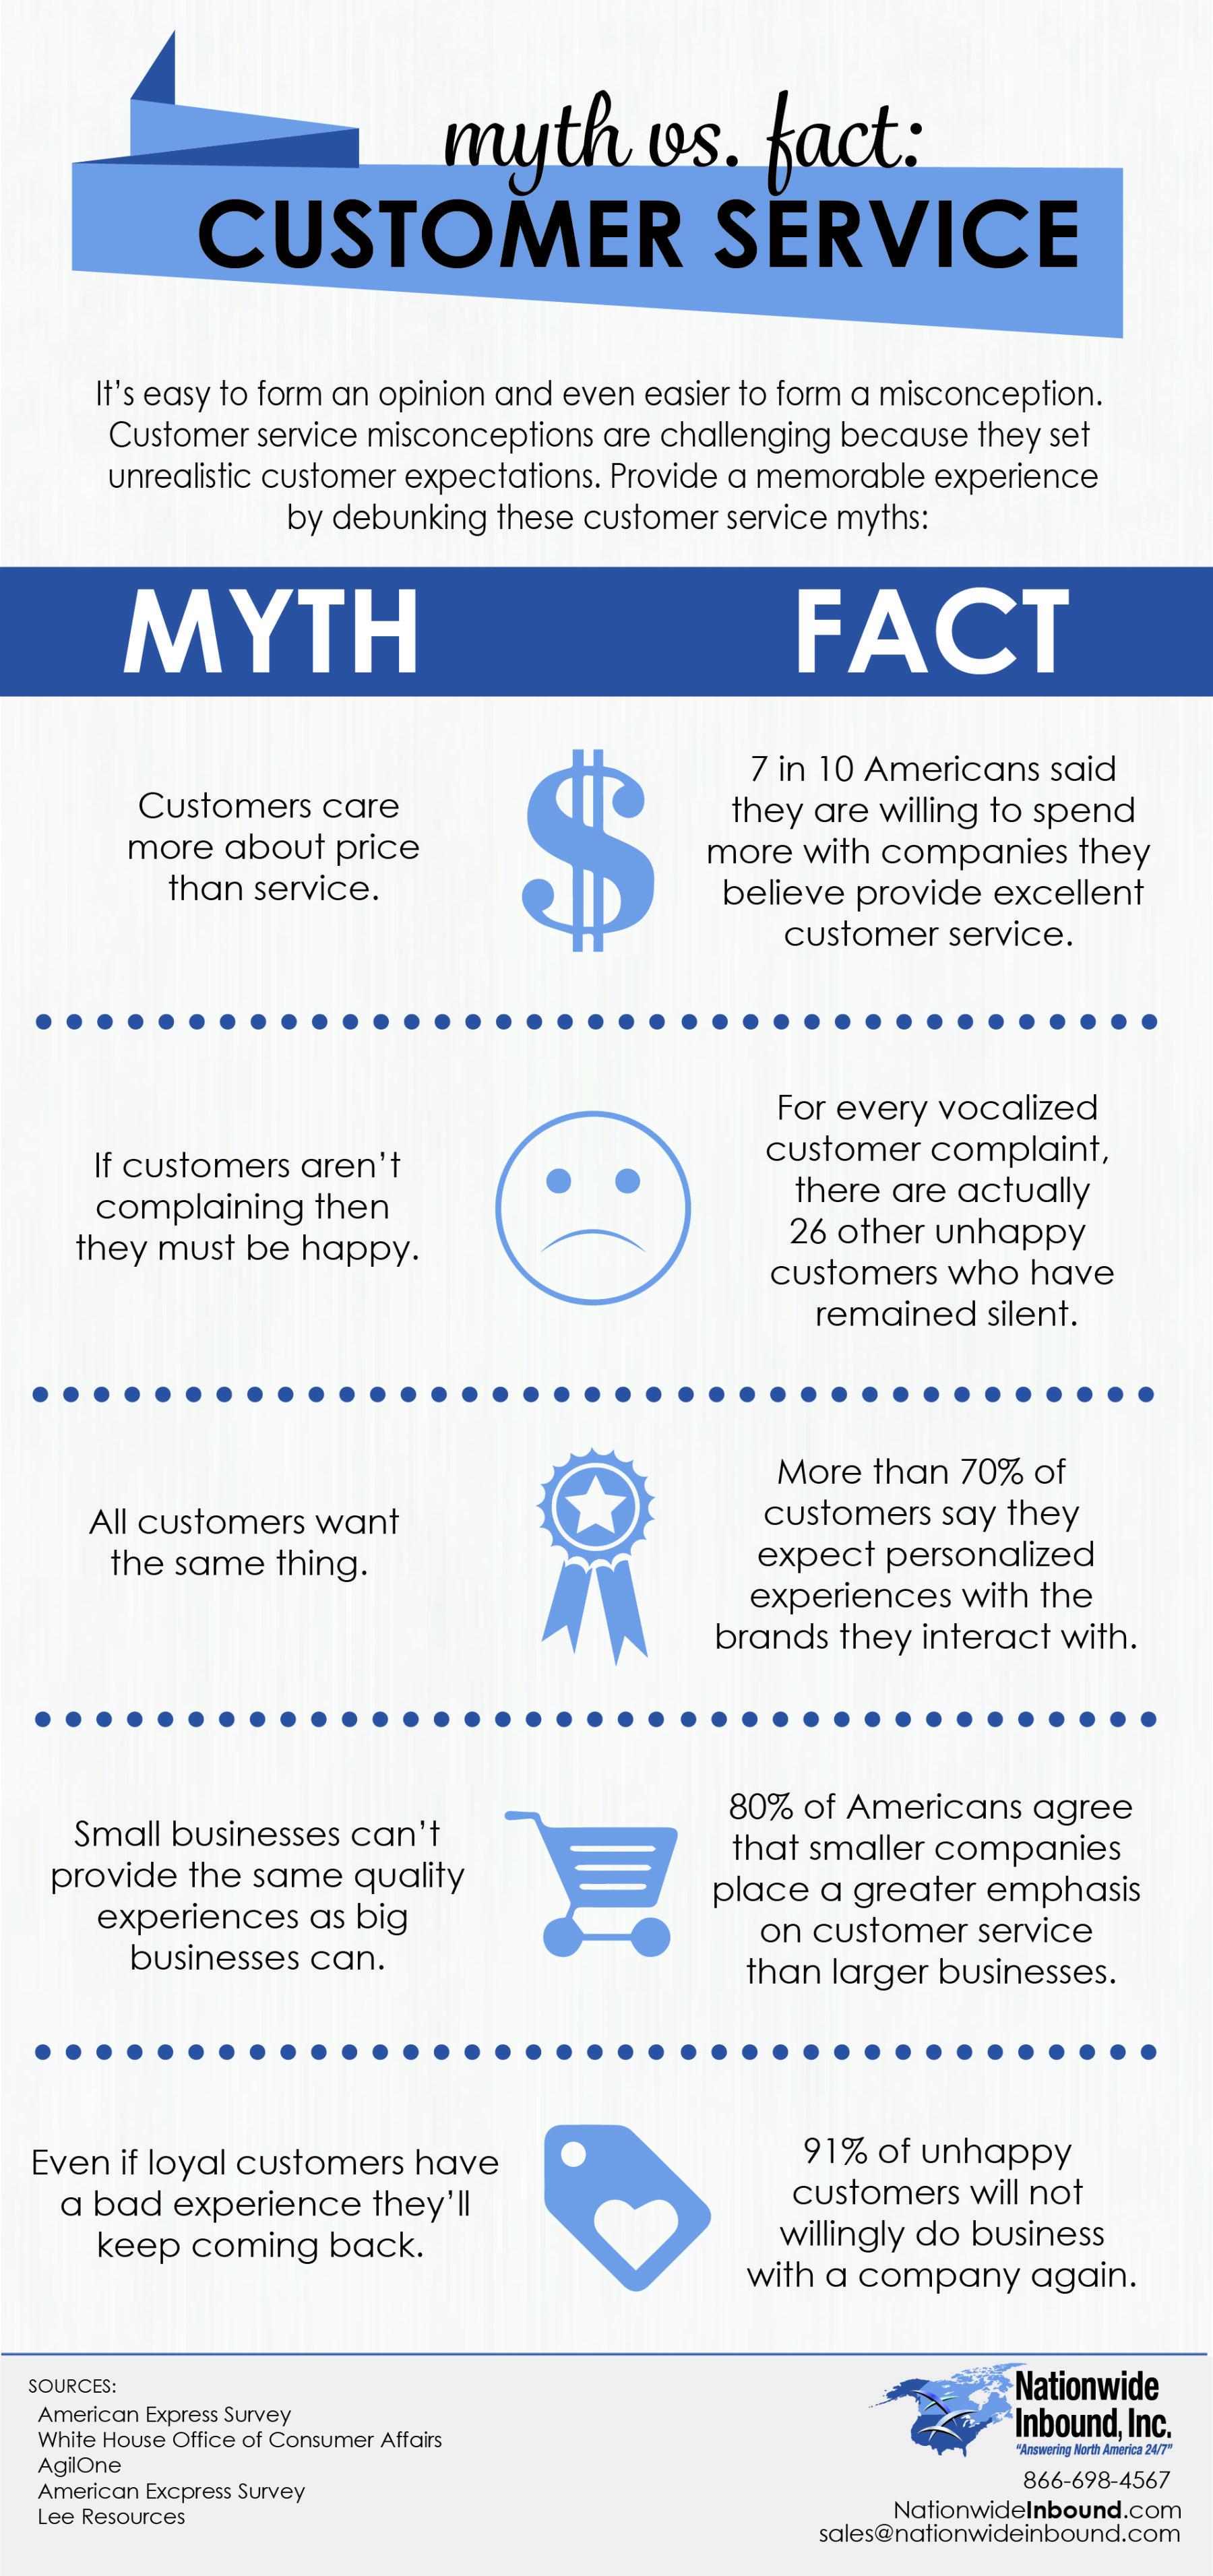 Myth Vs Fact Customer Service Infographic